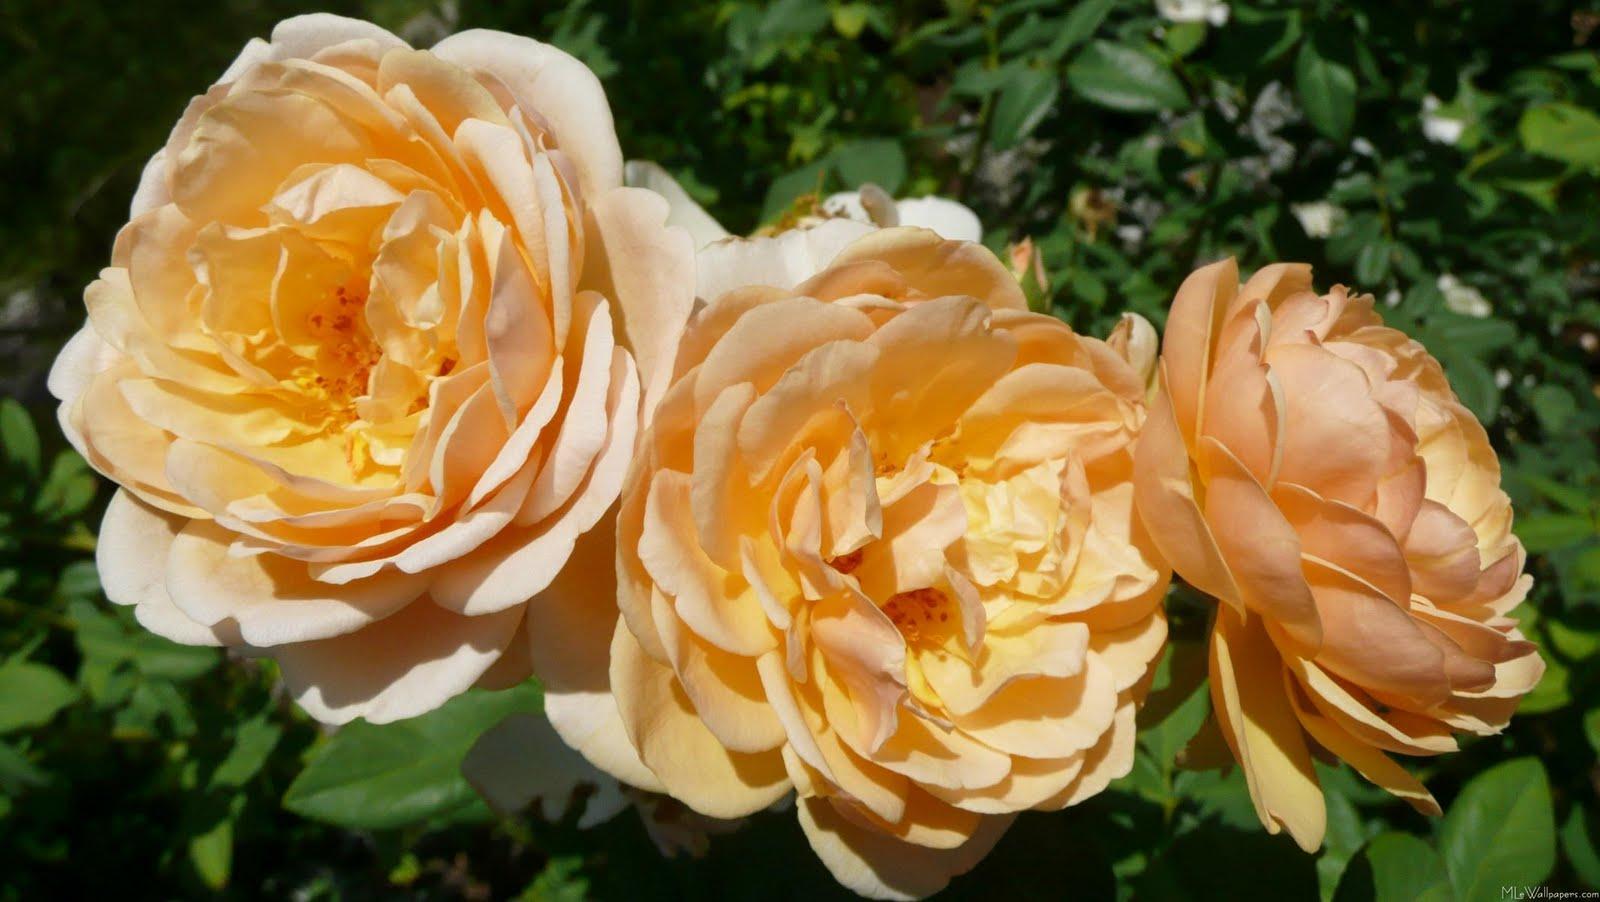 Wedding flowers peach roses - Peach rose wallpaper ...